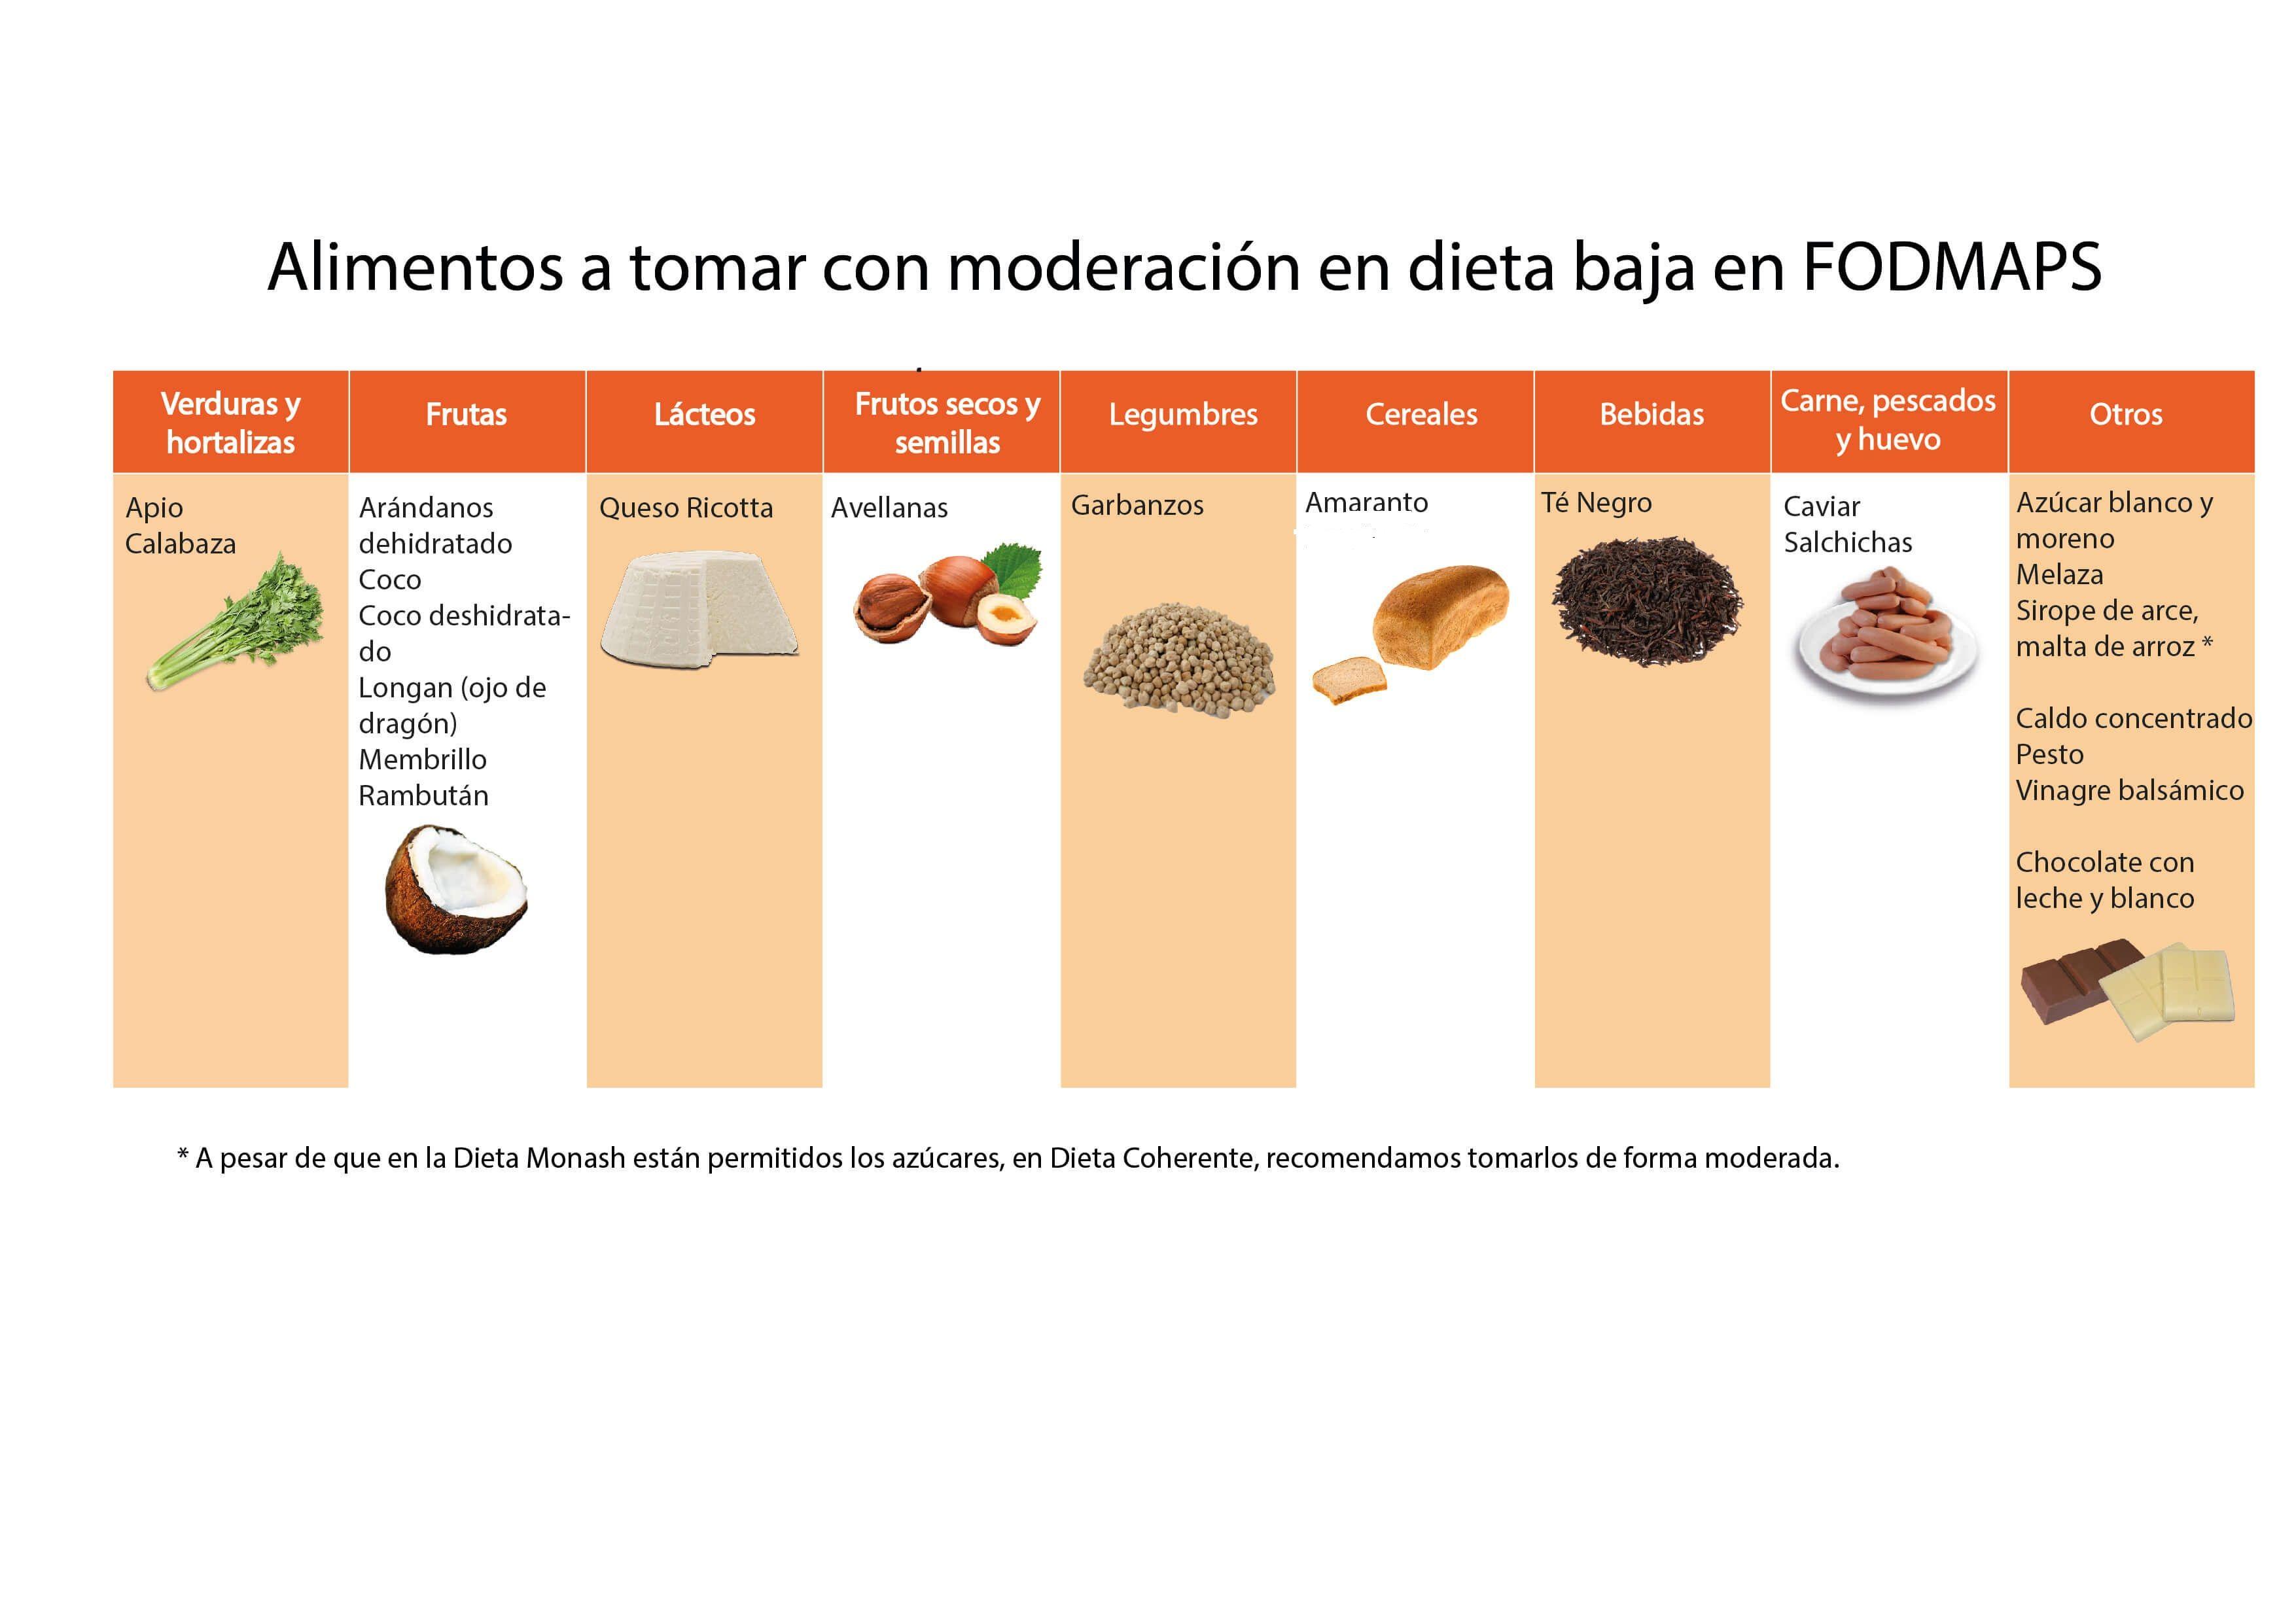 Dieta baja en sodio alimentos permitidos